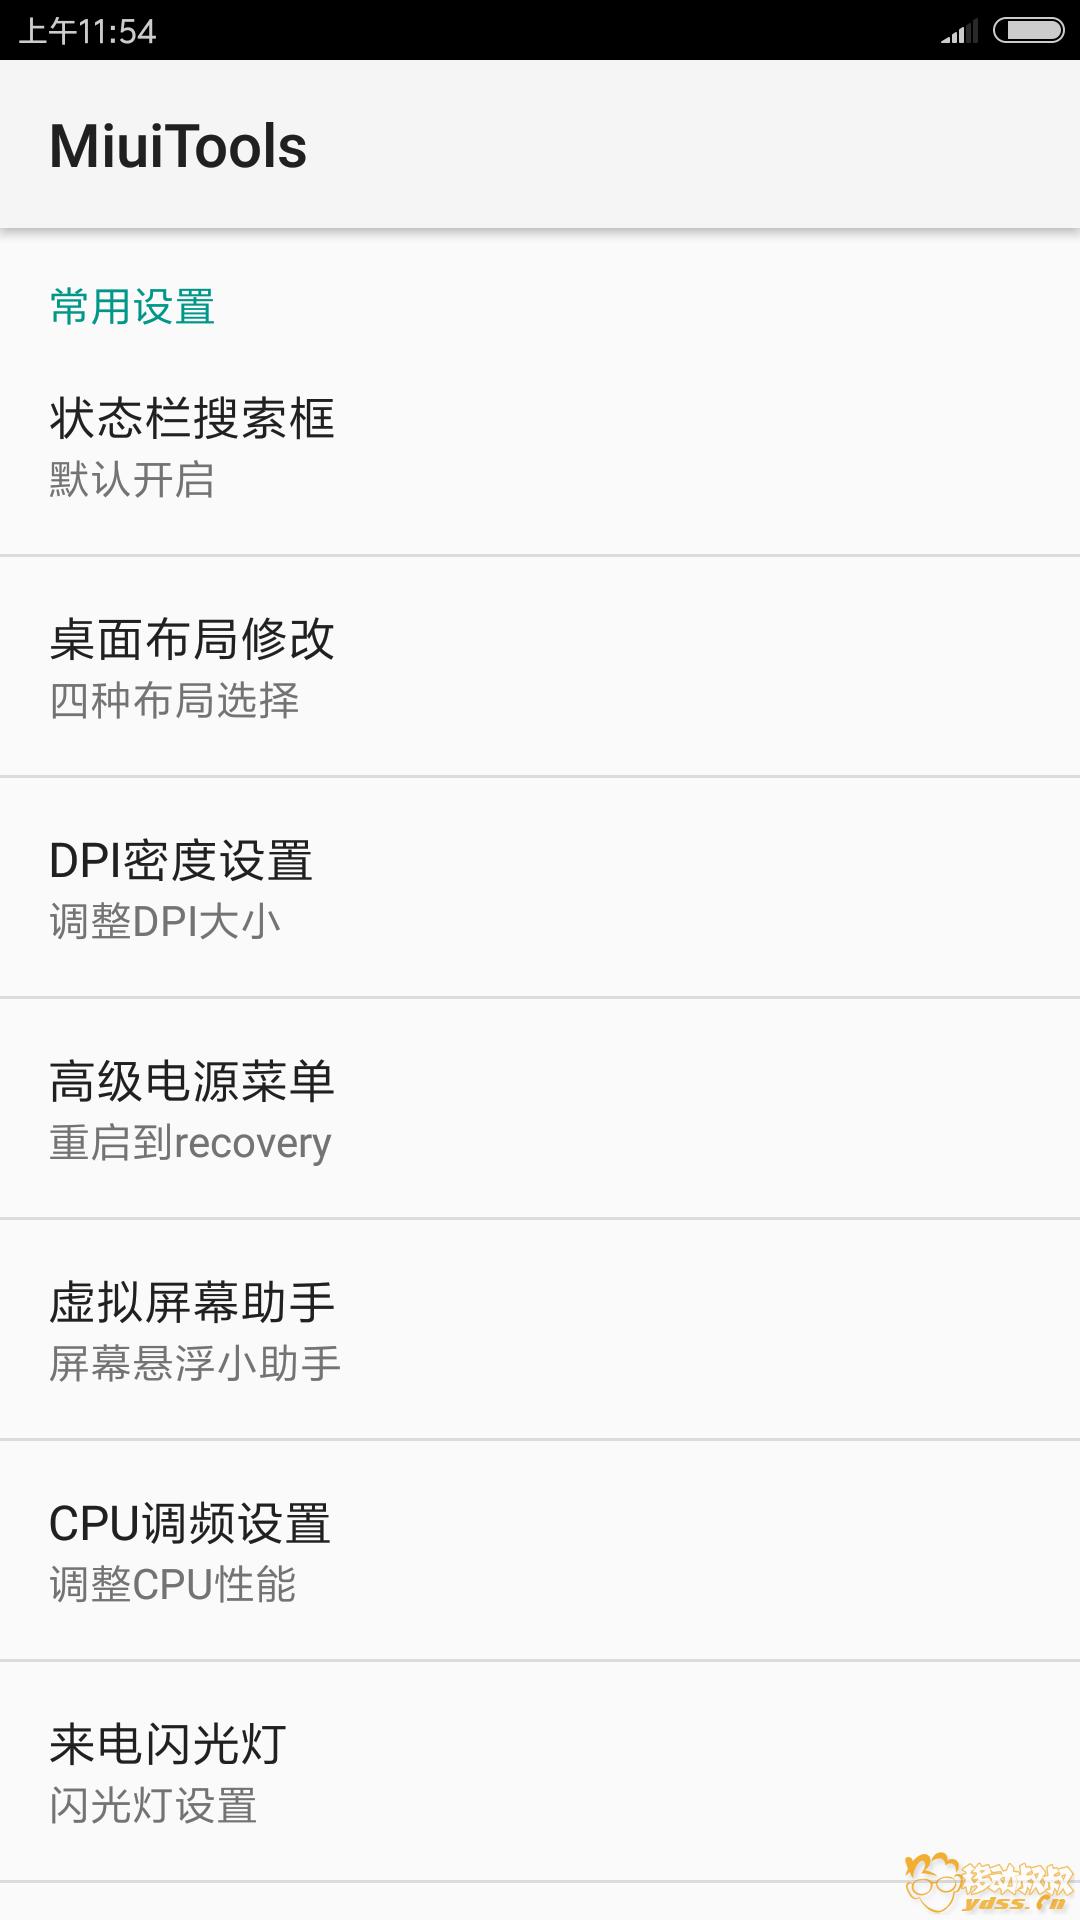 Screenshot_2017-09-29-11-54-14-976_com.anzhi.hwsettings.png